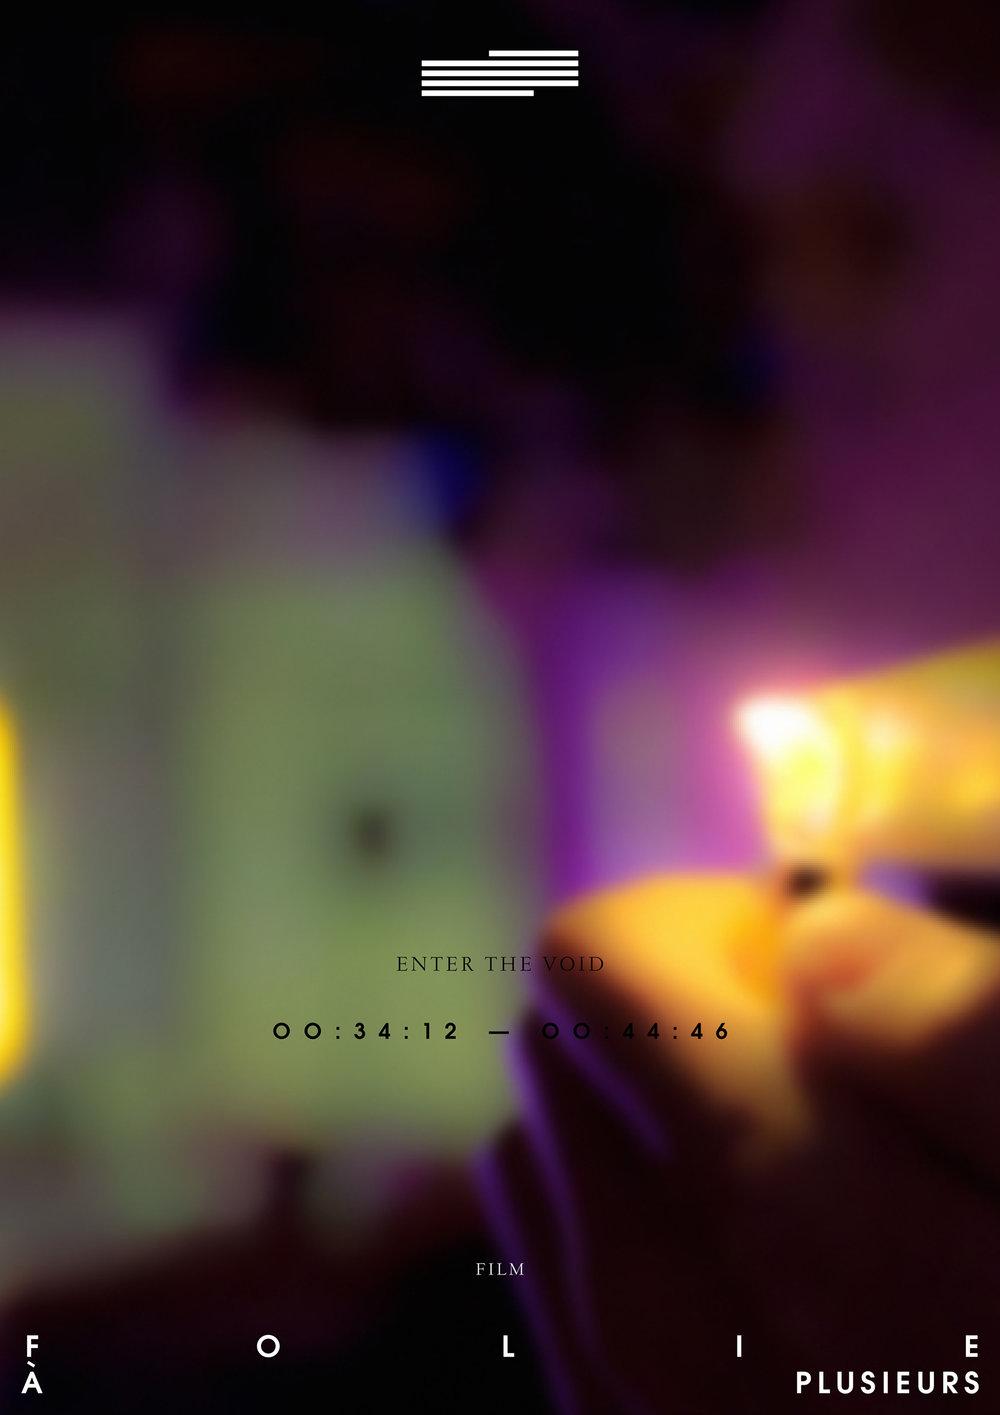 Folie-A-Plusieurs-Enter-The-Void-Perfume.jpg